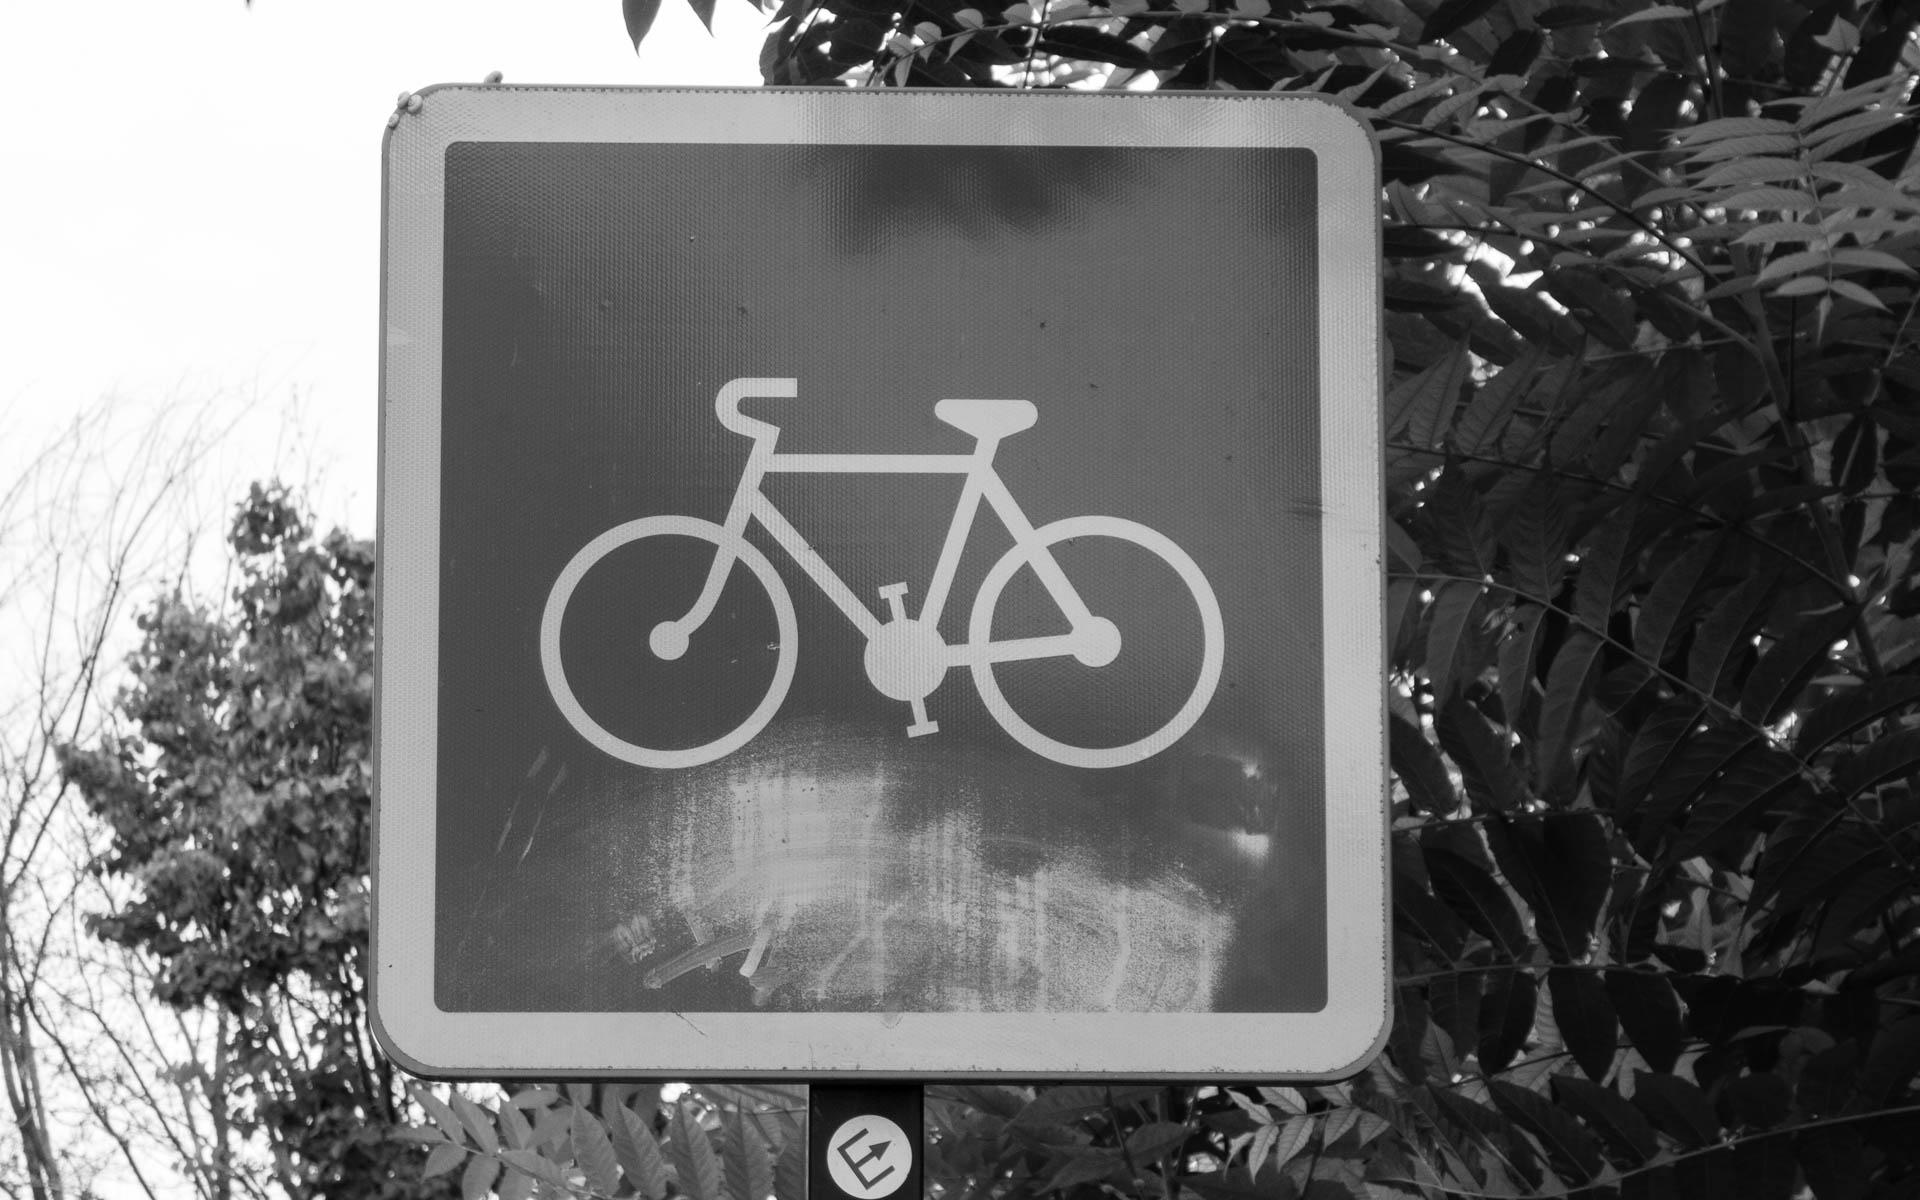 Fahrradschield in der Provence